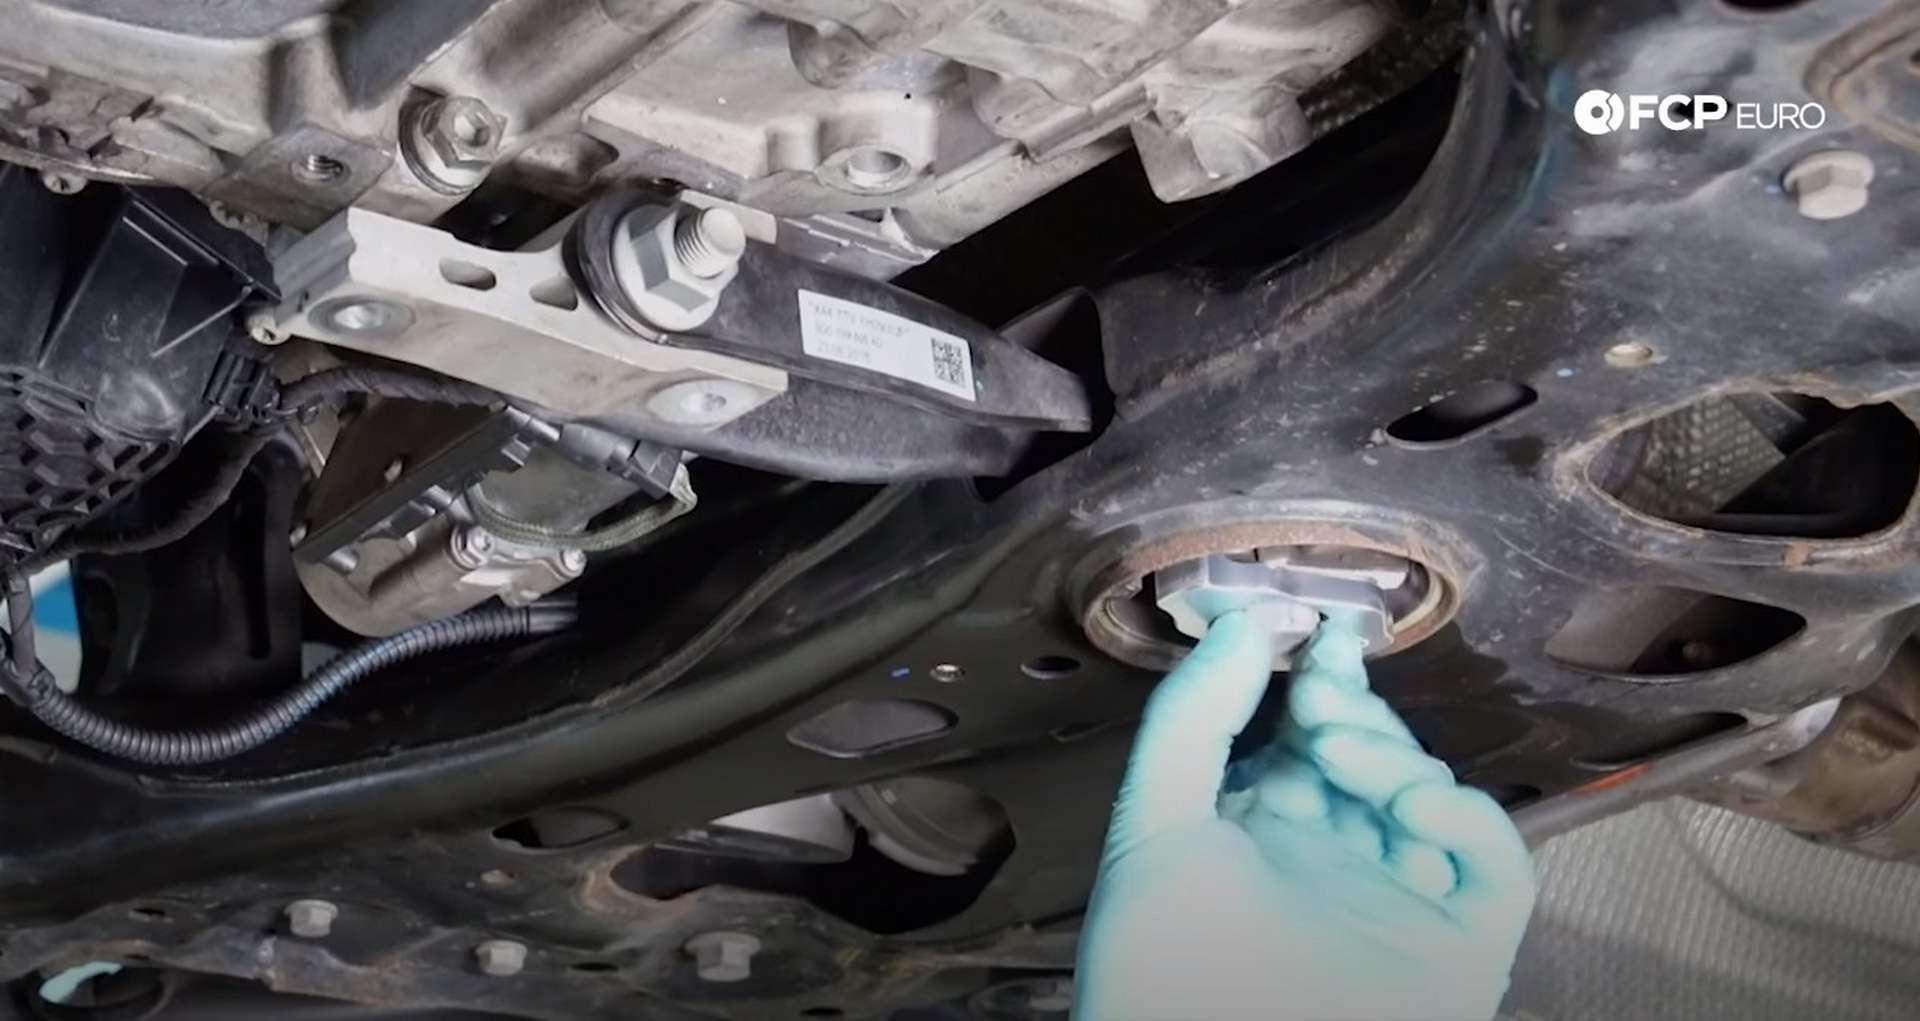 65-DIY_VW_GTI_Clutch-Job-Reinstalling-Starter